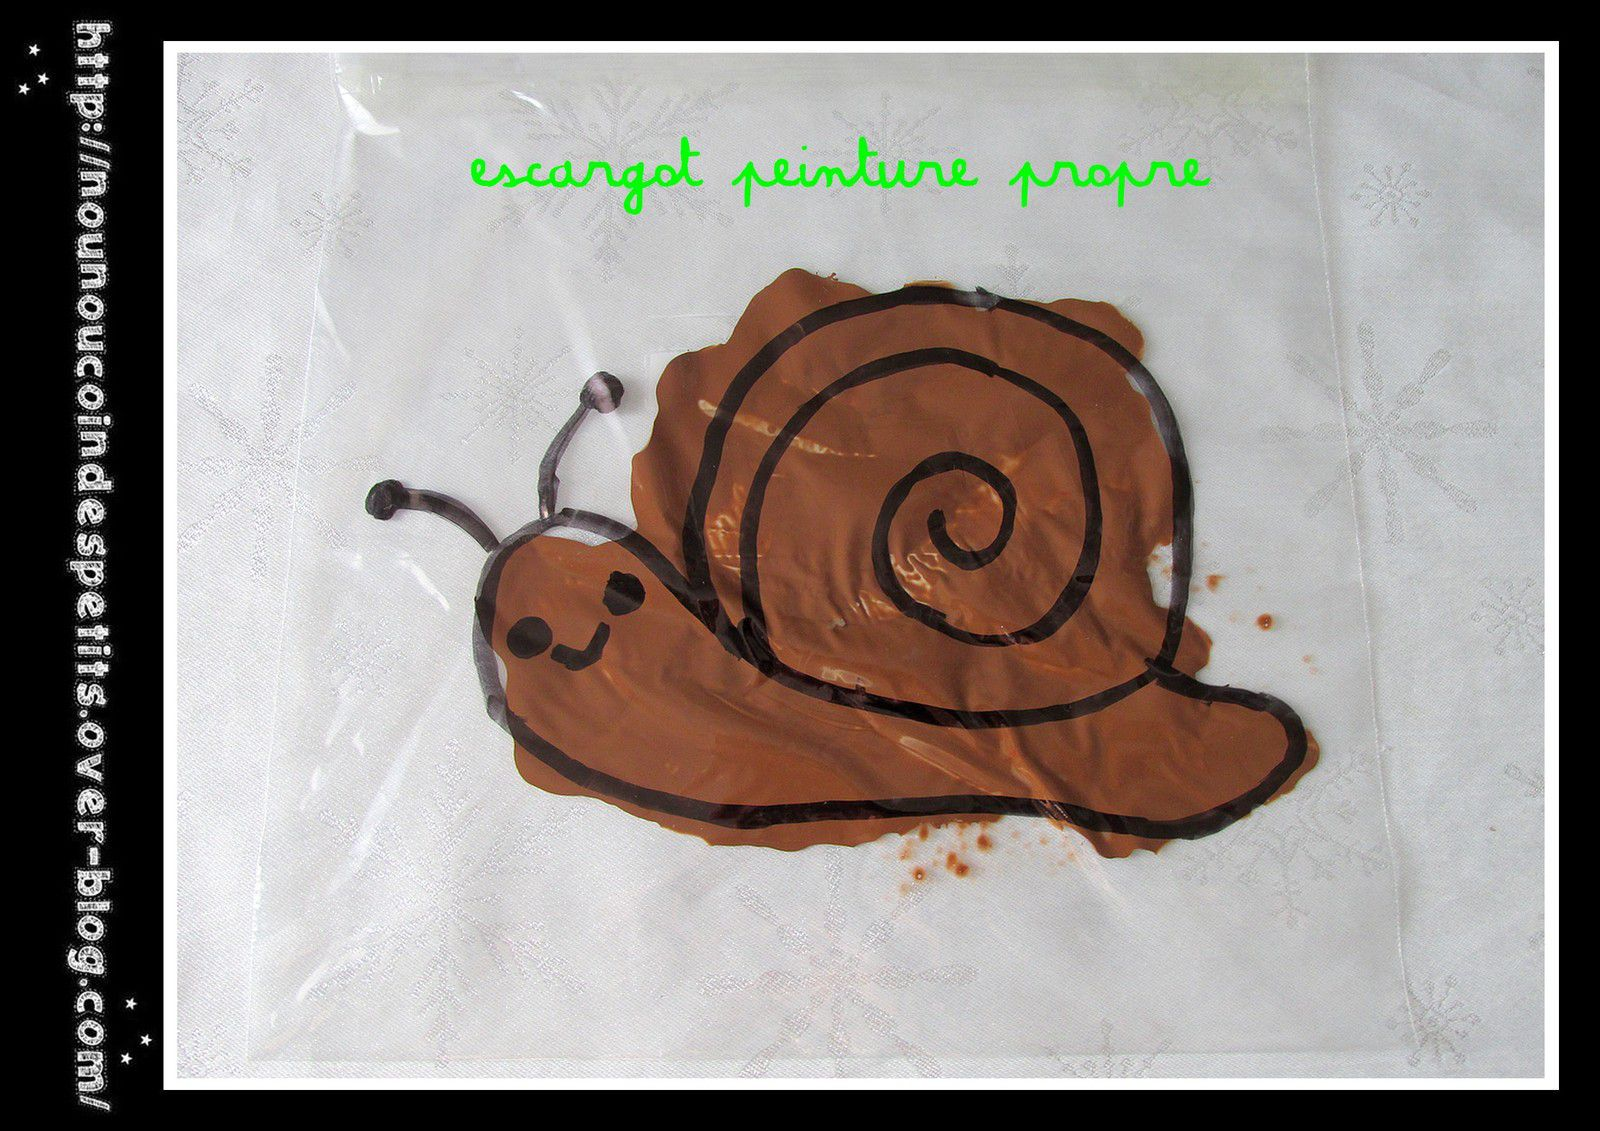 .. Escargot peinture propre ..